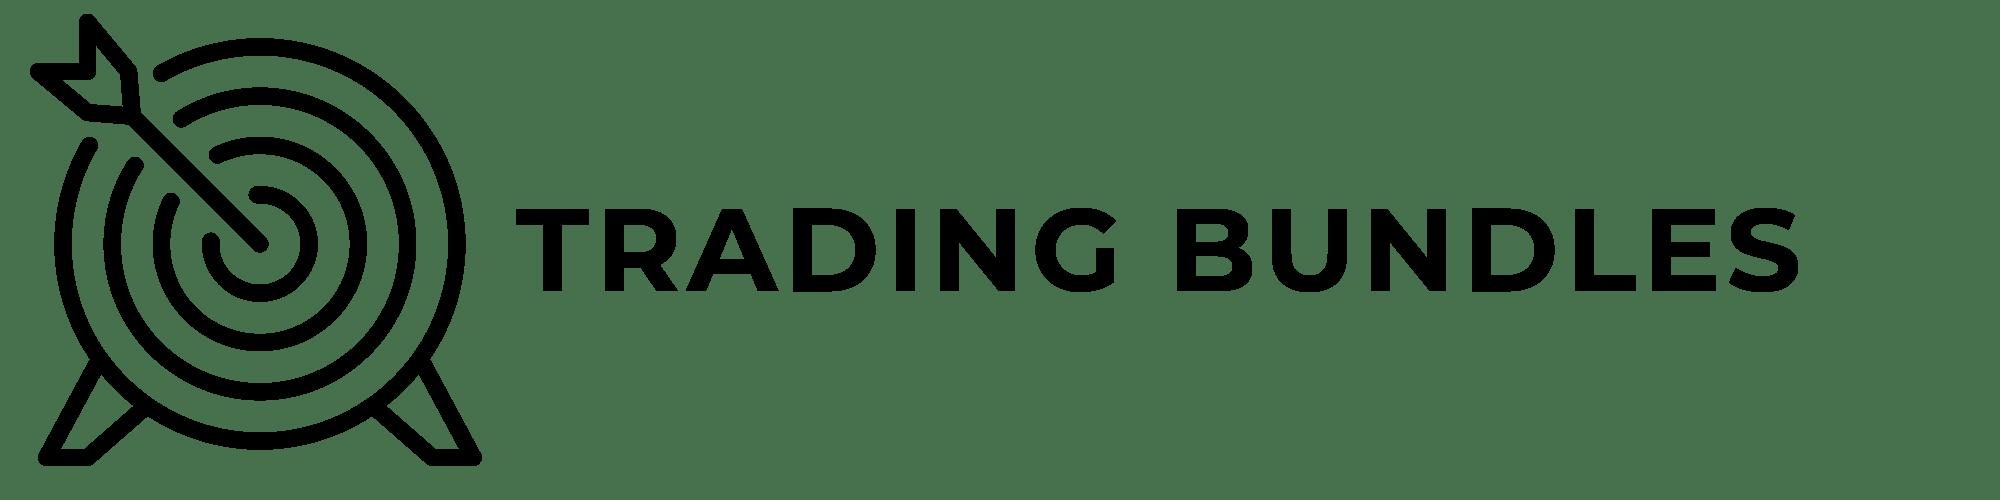 Trading Methods Menu Nav Image V3